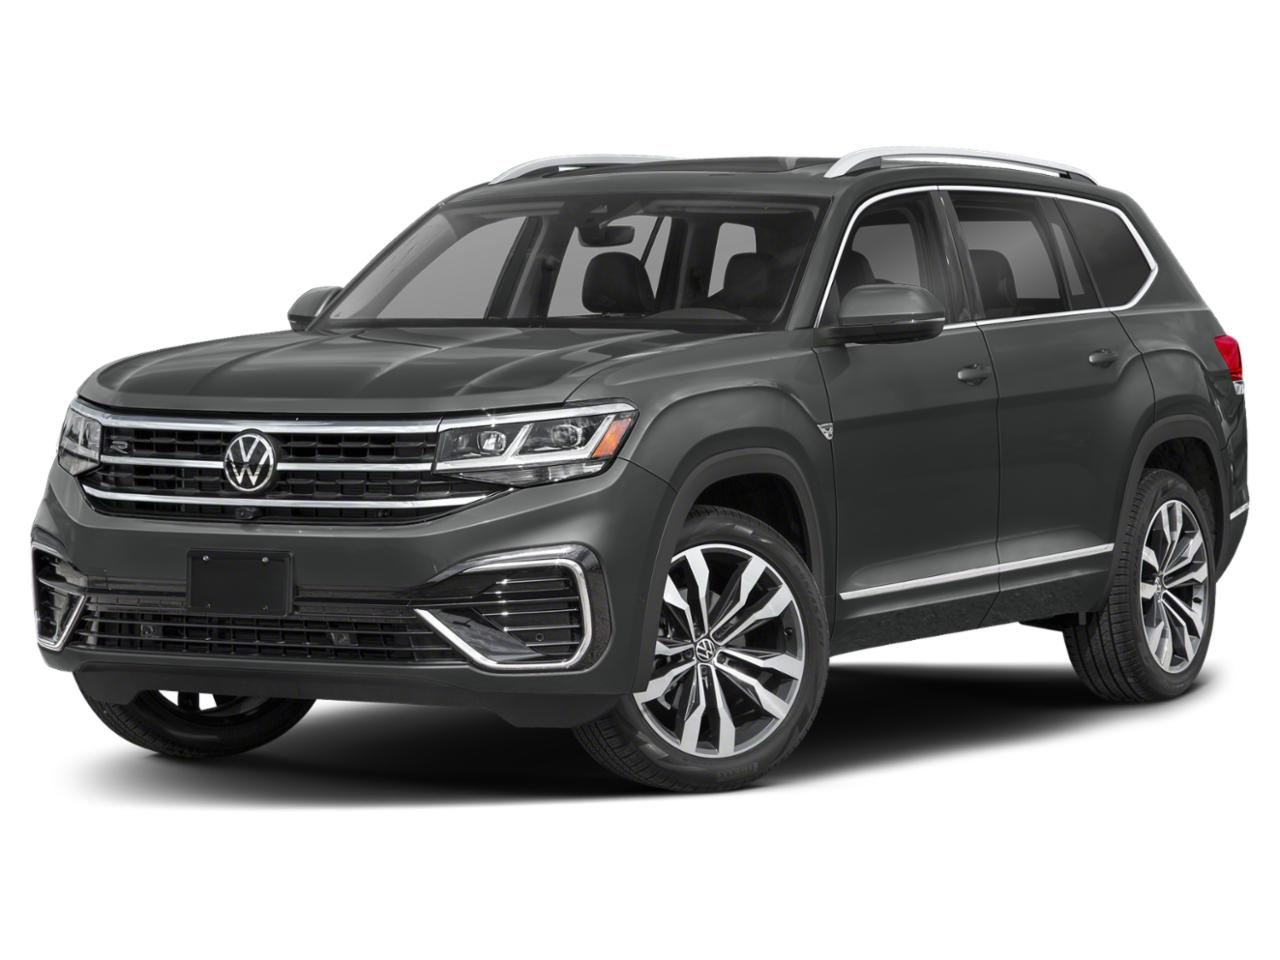 2021 Volkswagen Atlas Vehicle Photo in Oshkosh, WI 54904